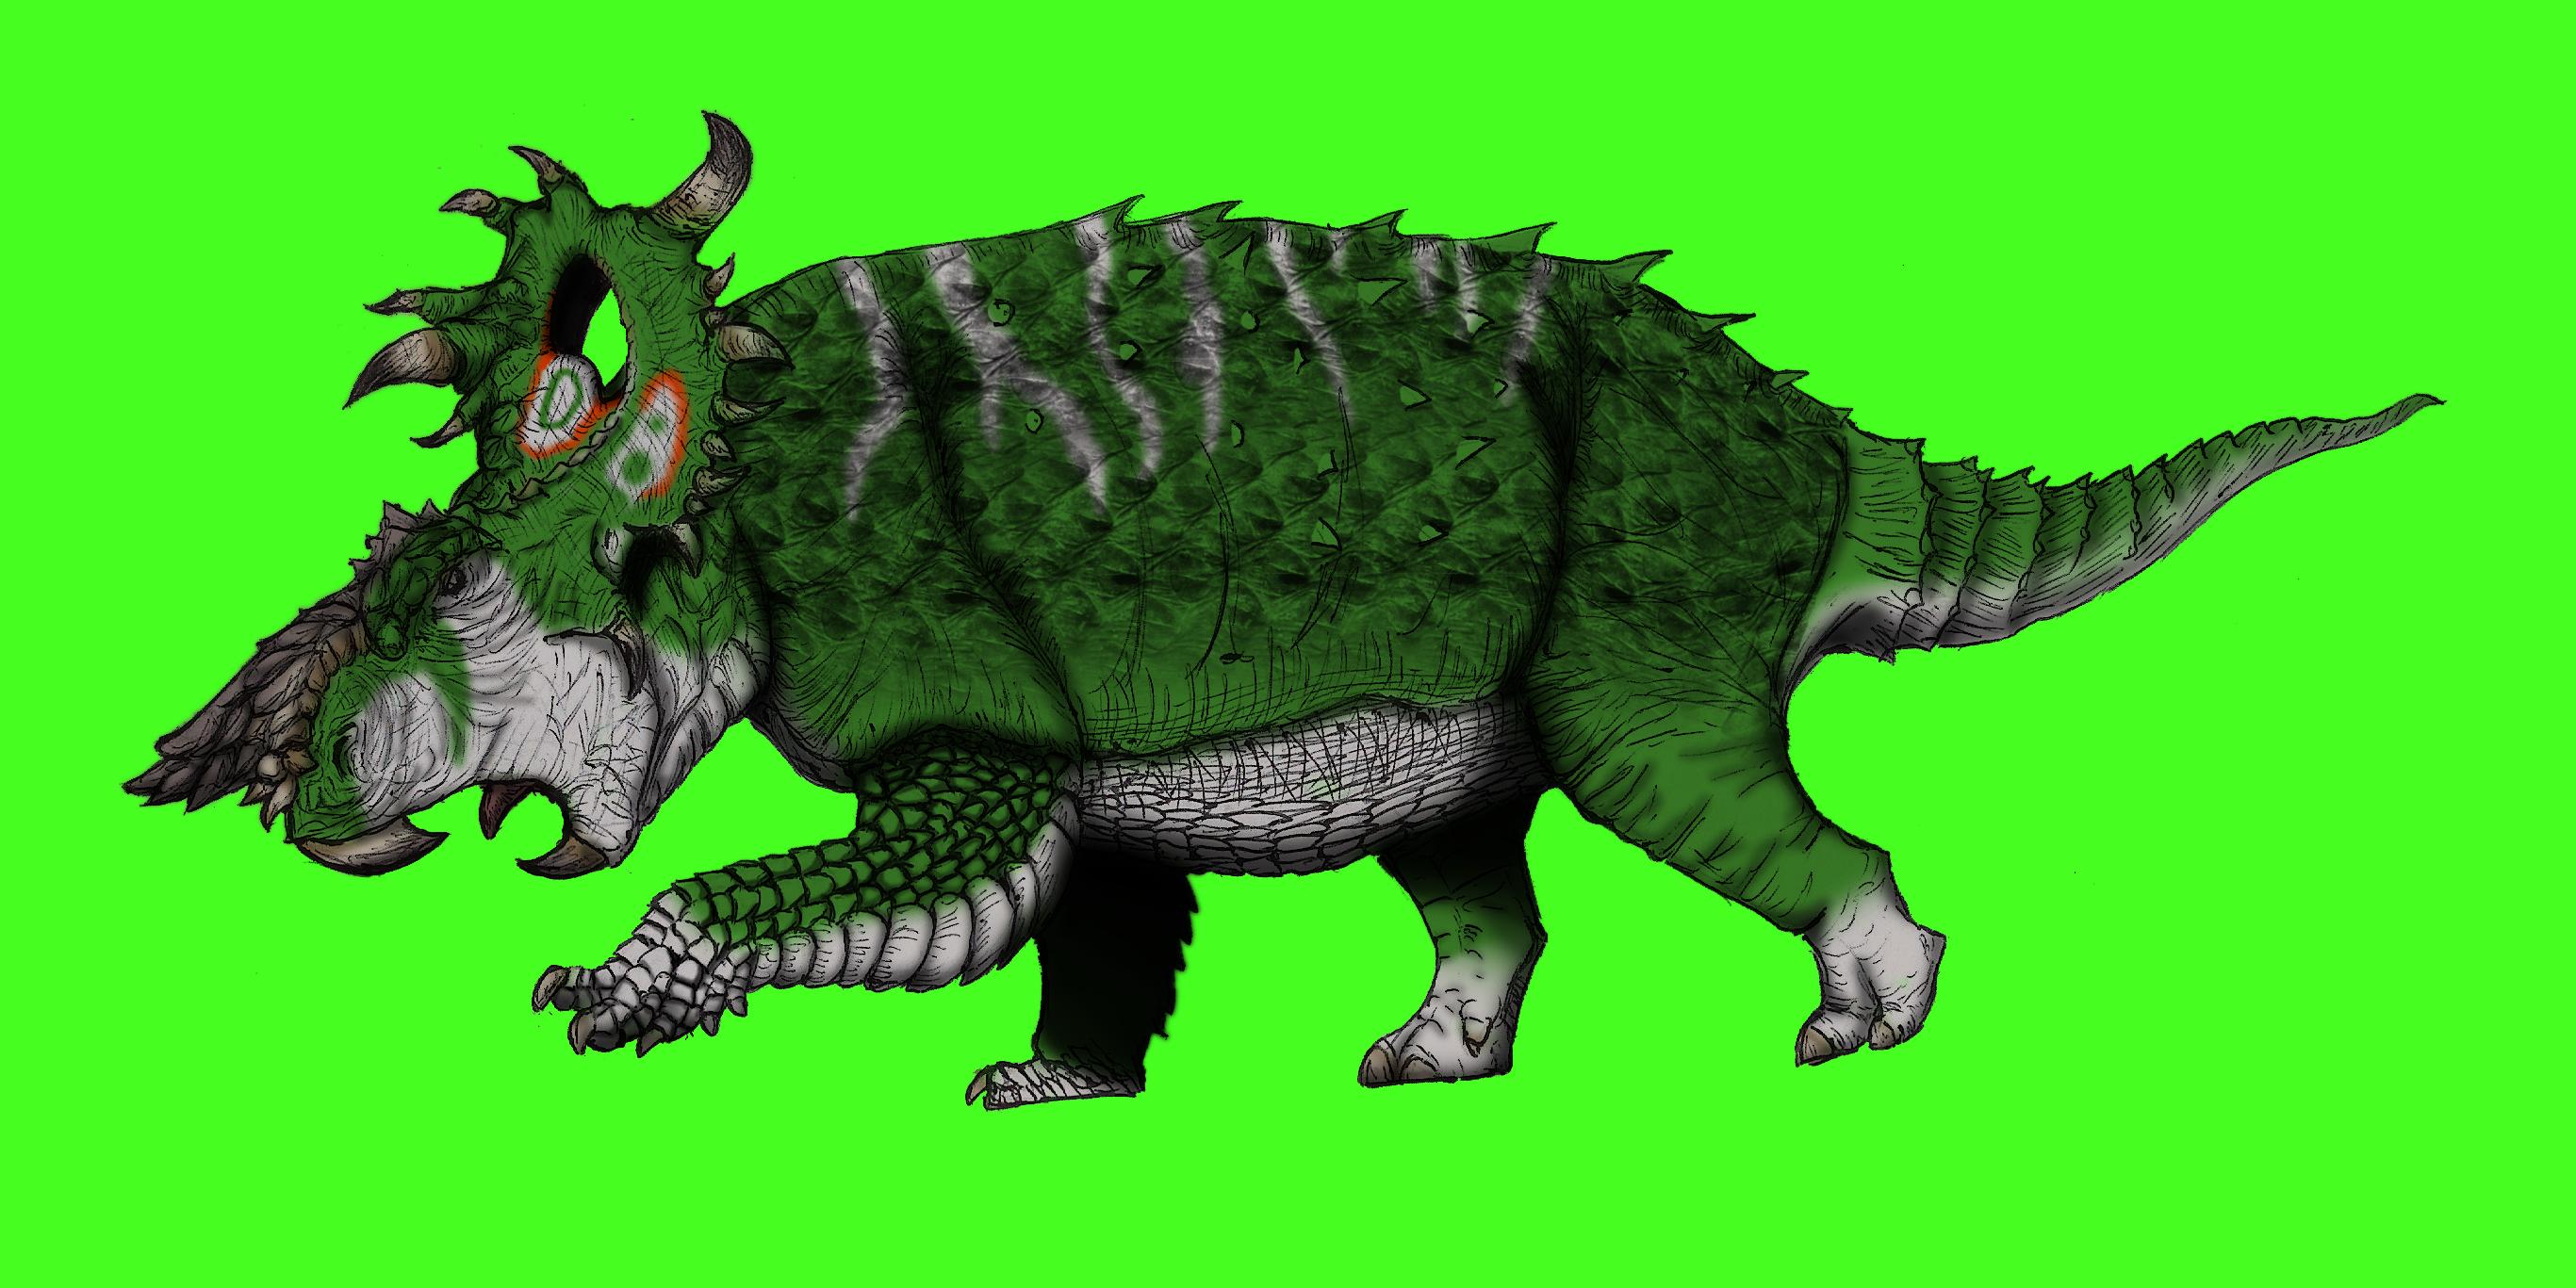 Dinovember day 2 - Pachyrhinosaurus redesign by kingrexy